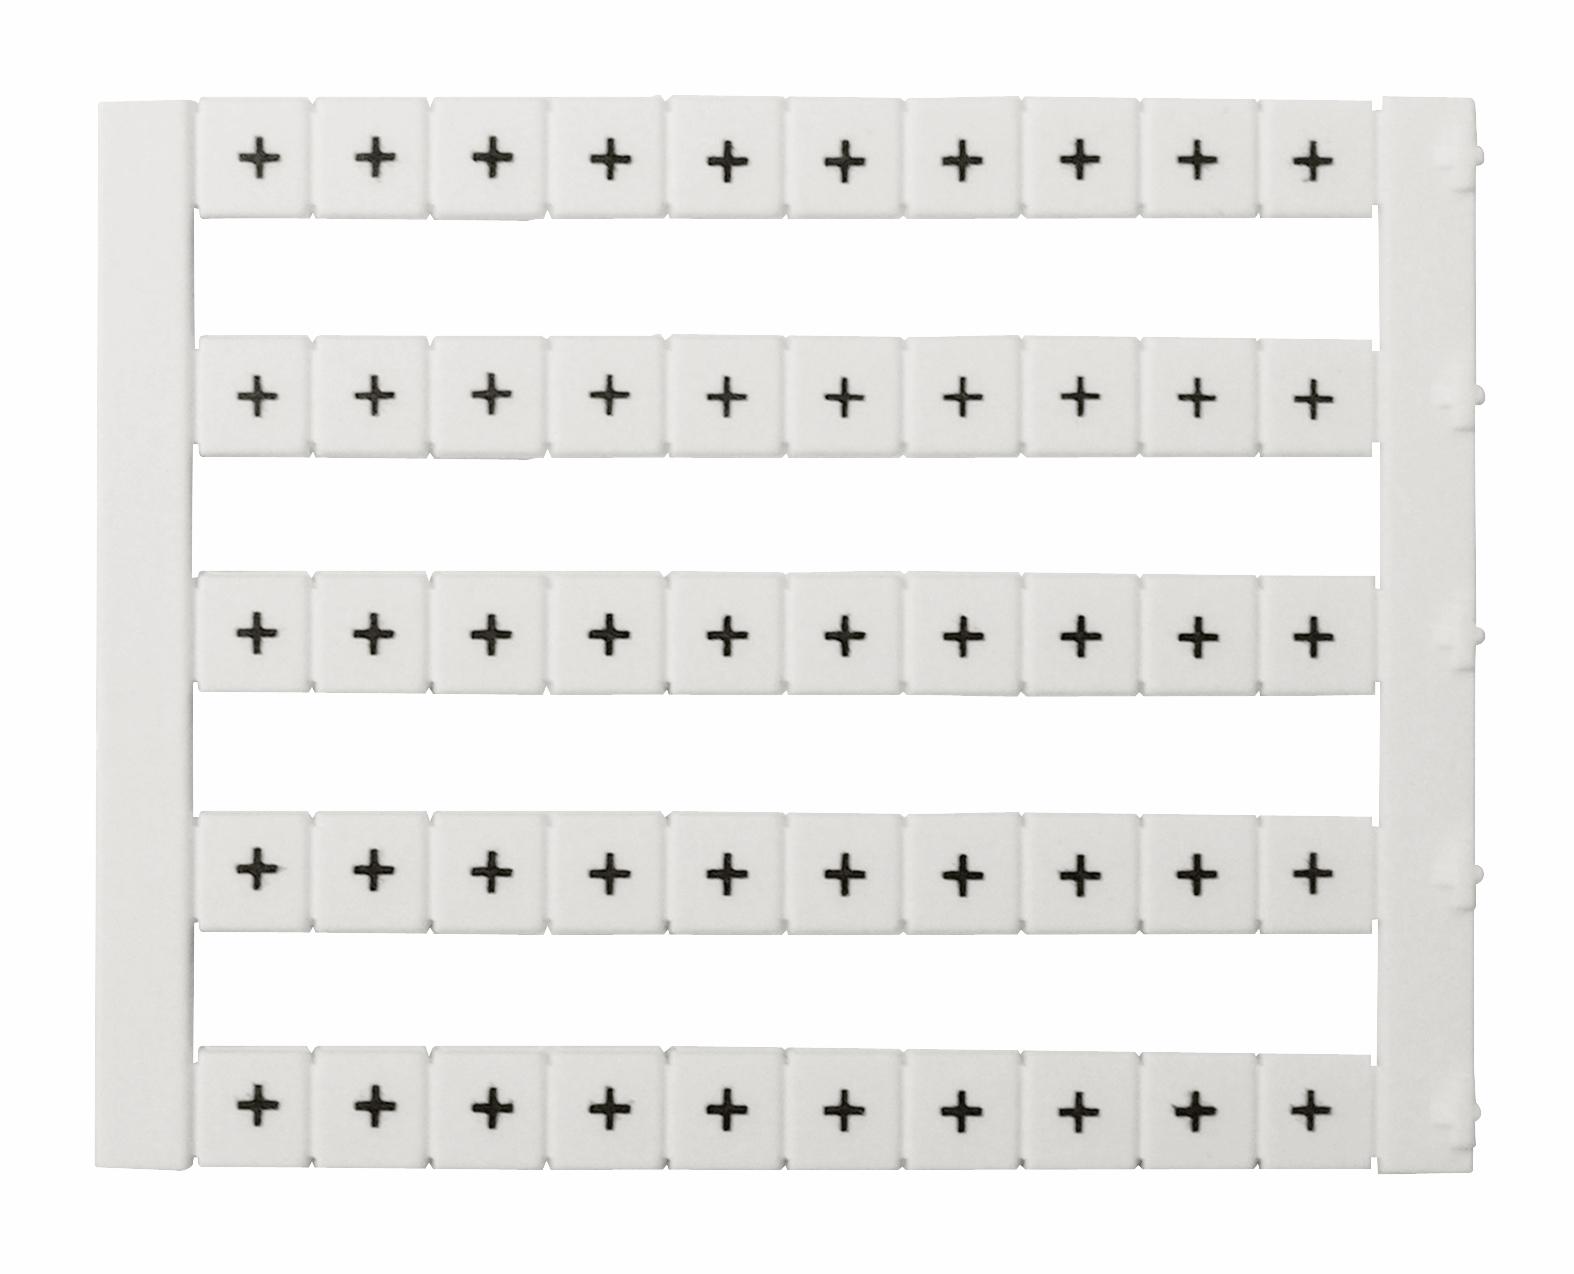 1 Stk Markierungsetiketten DY 5 bedruckt mit + (50-mal) IK697085--